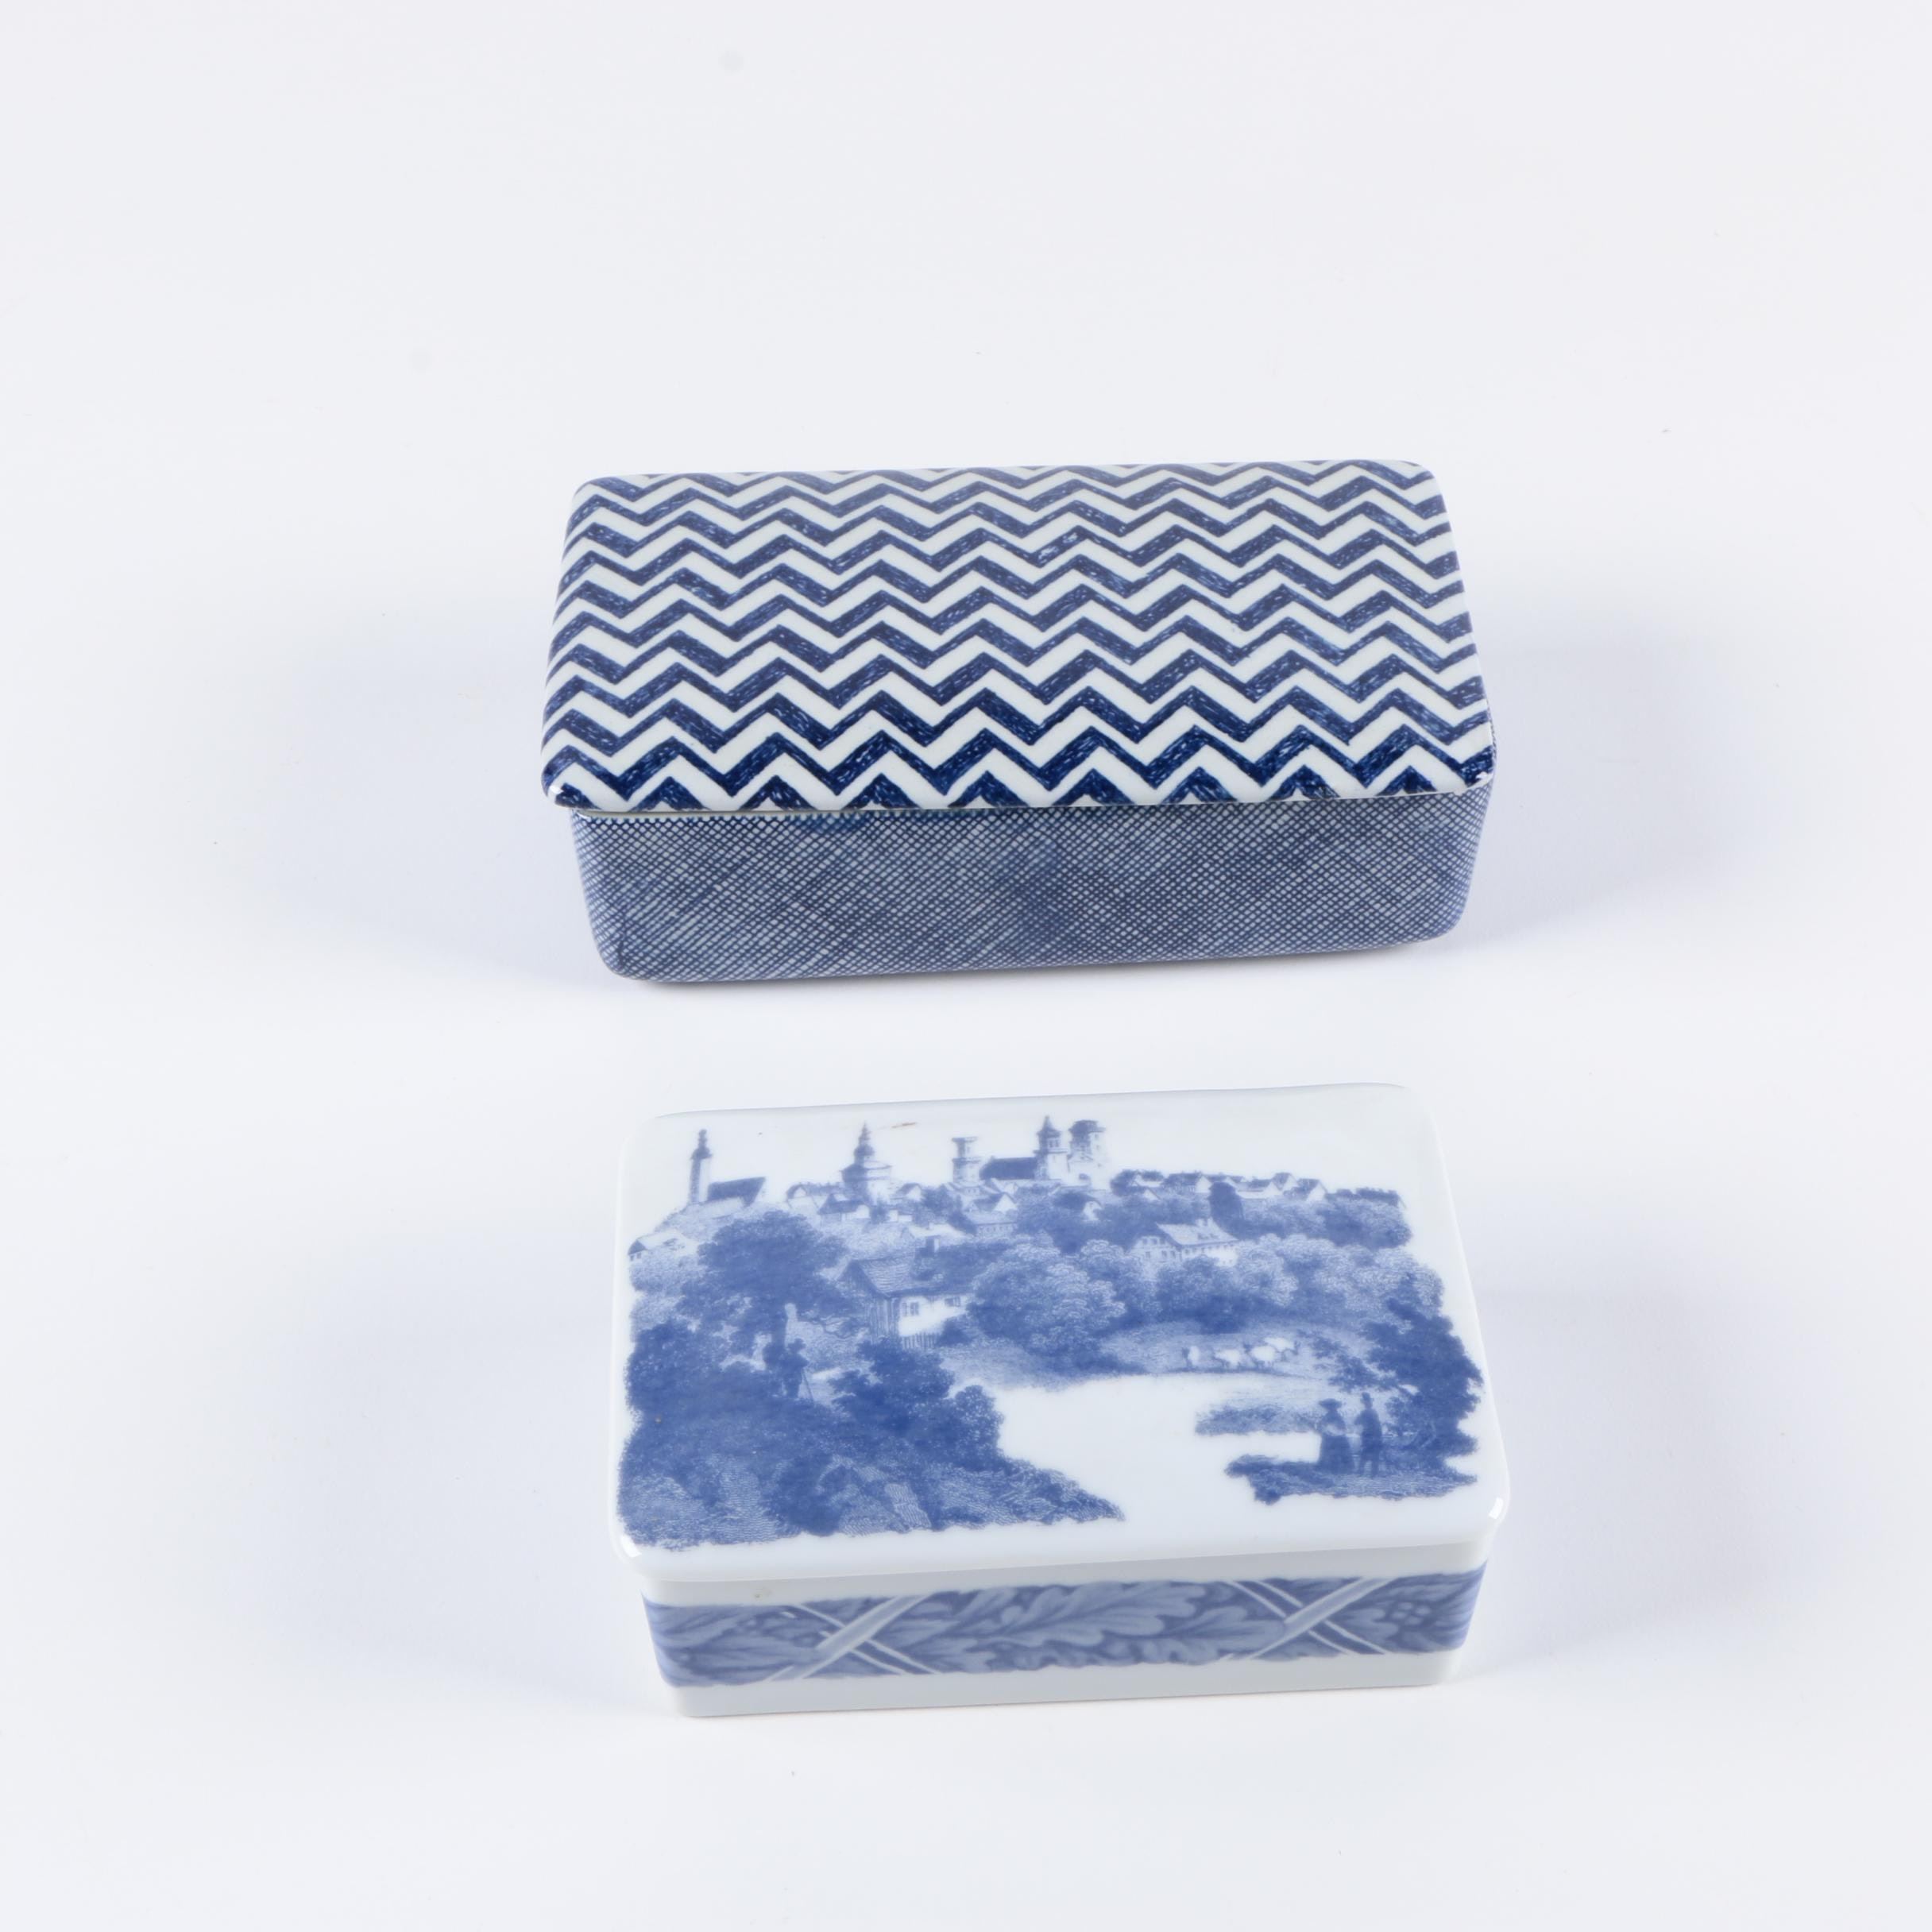 Nymølle and Estee Lauder Trinket Boxes